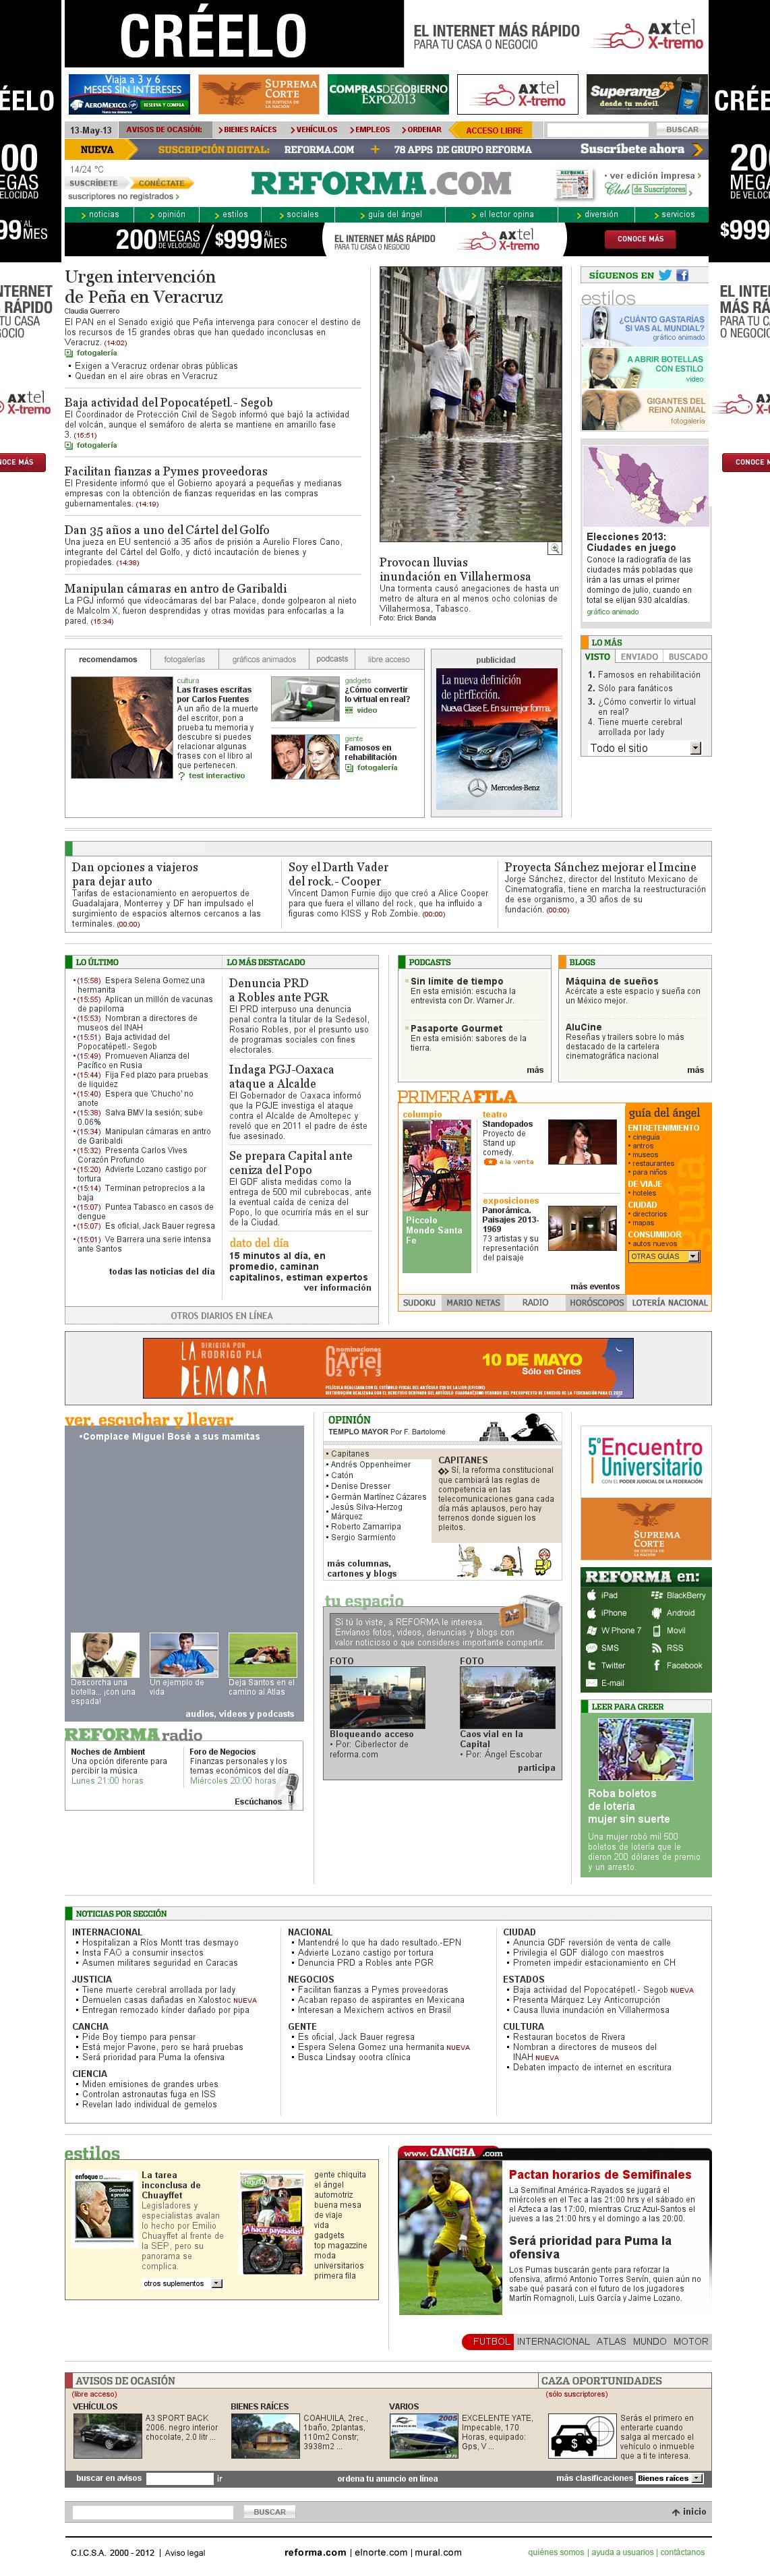 Reforma.com at Monday May 13, 2013, 9:19 p.m. UTC